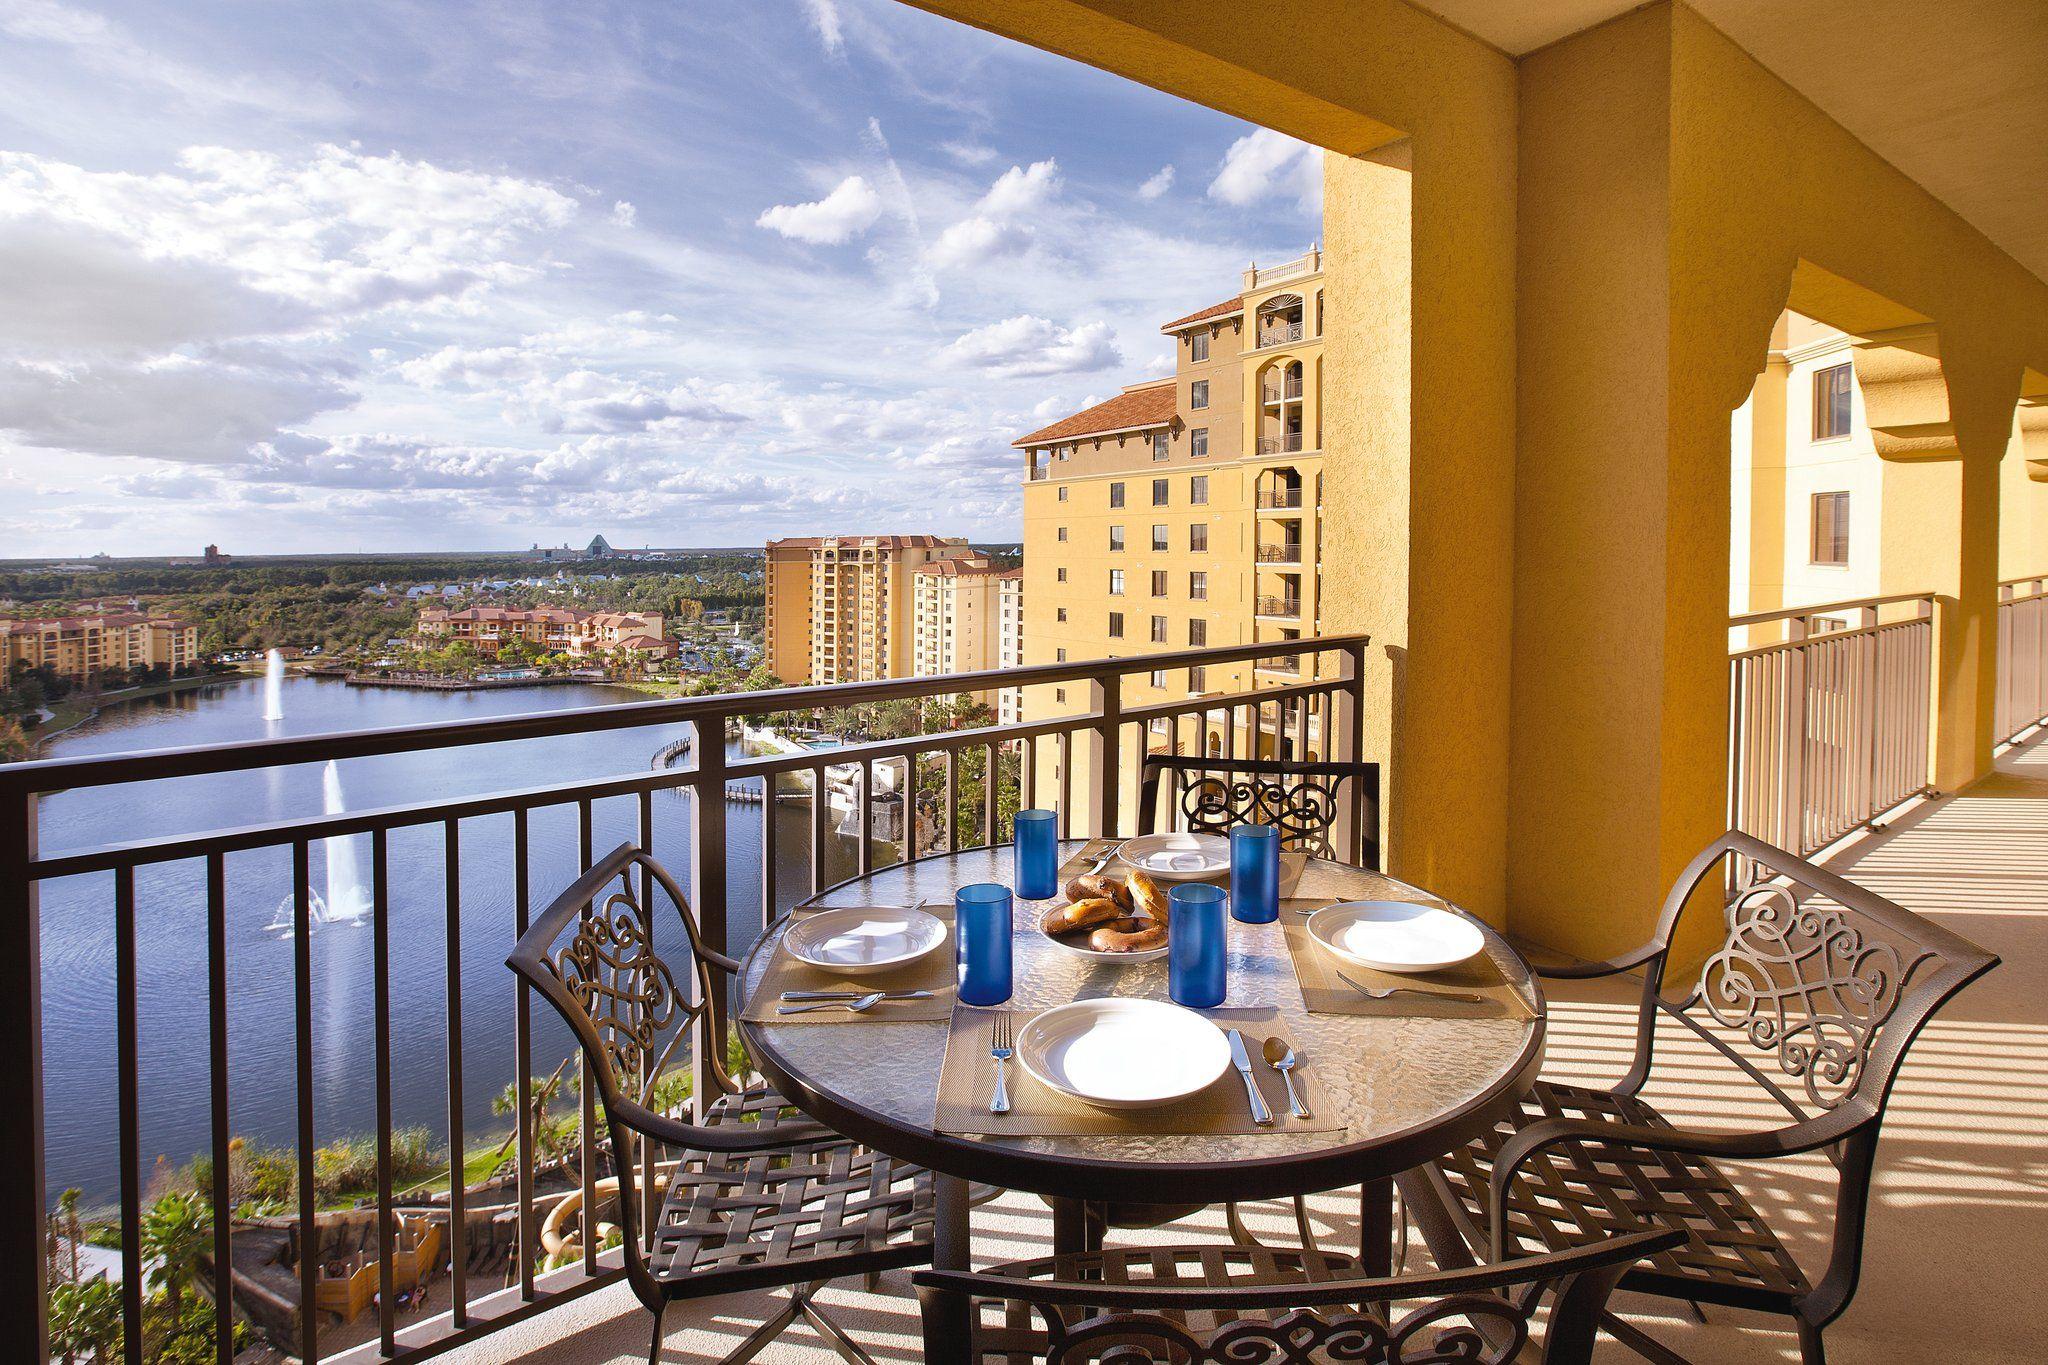 Enjoy Condo Style Family Suites Next To Walt Disney World Resort With Pools Mini Golf Wyndham Bonnet Creek Wyndham Bonnet Creek Orlando Bonnet Creek Orlando